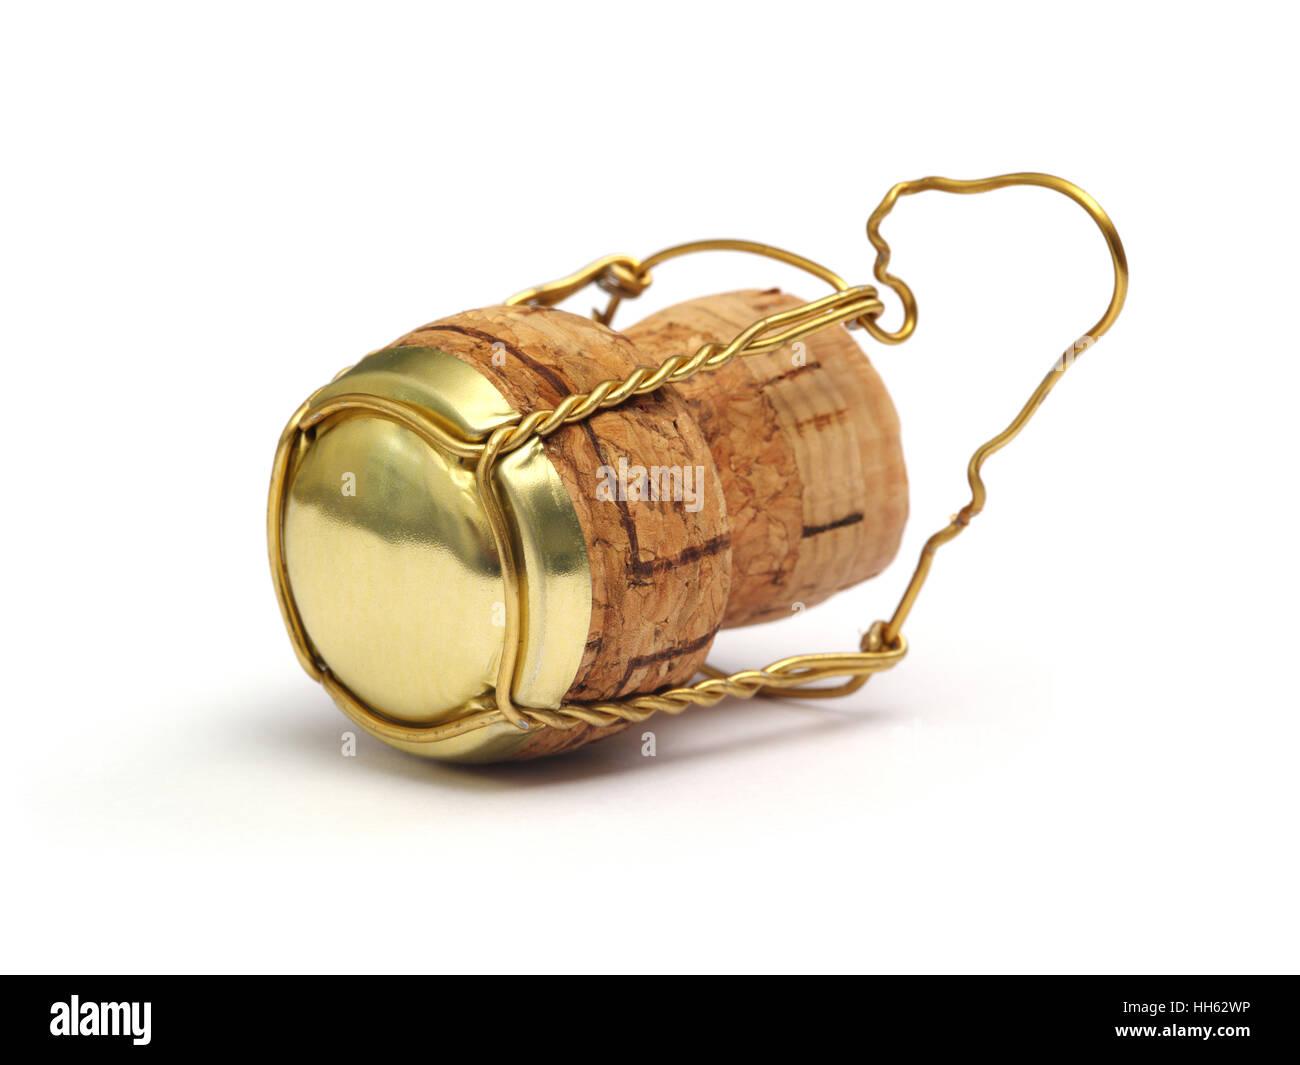 Wine Sparkling Wire Stockfotos & Wine Sparkling Wire Bilder - Alamy